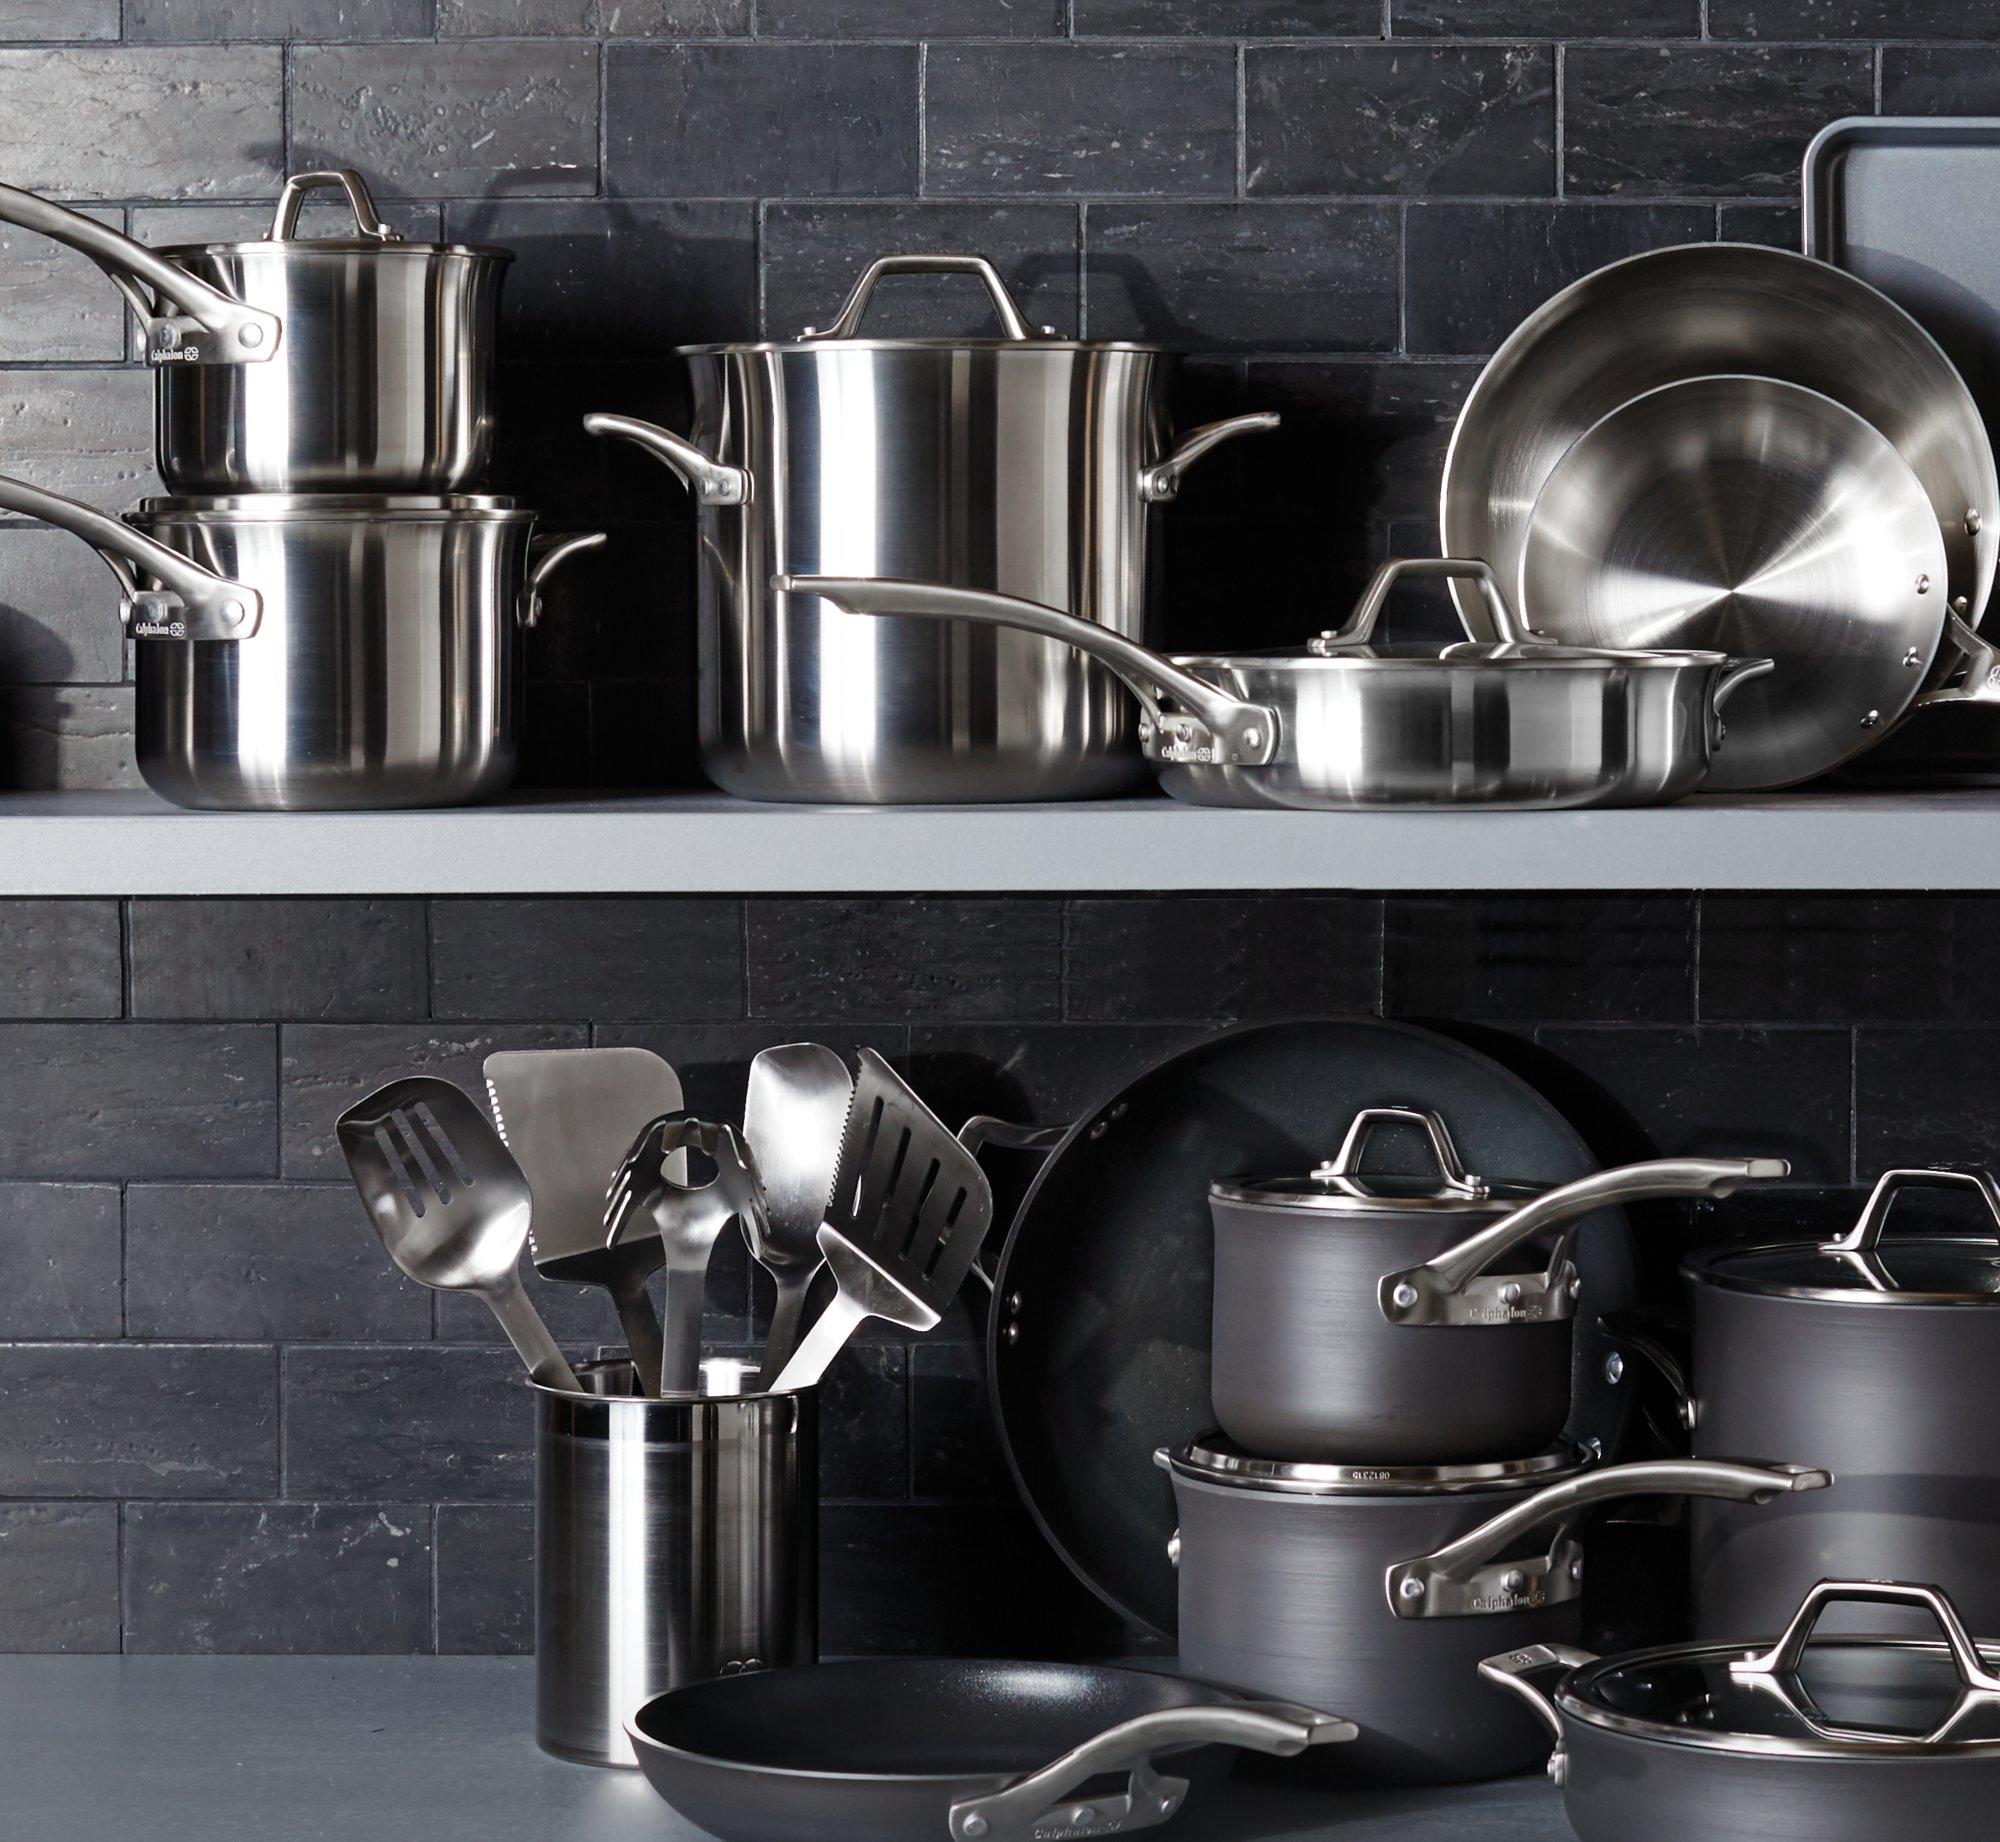 Calphalon Cookware Cutlery Bakeware Kitchenware More